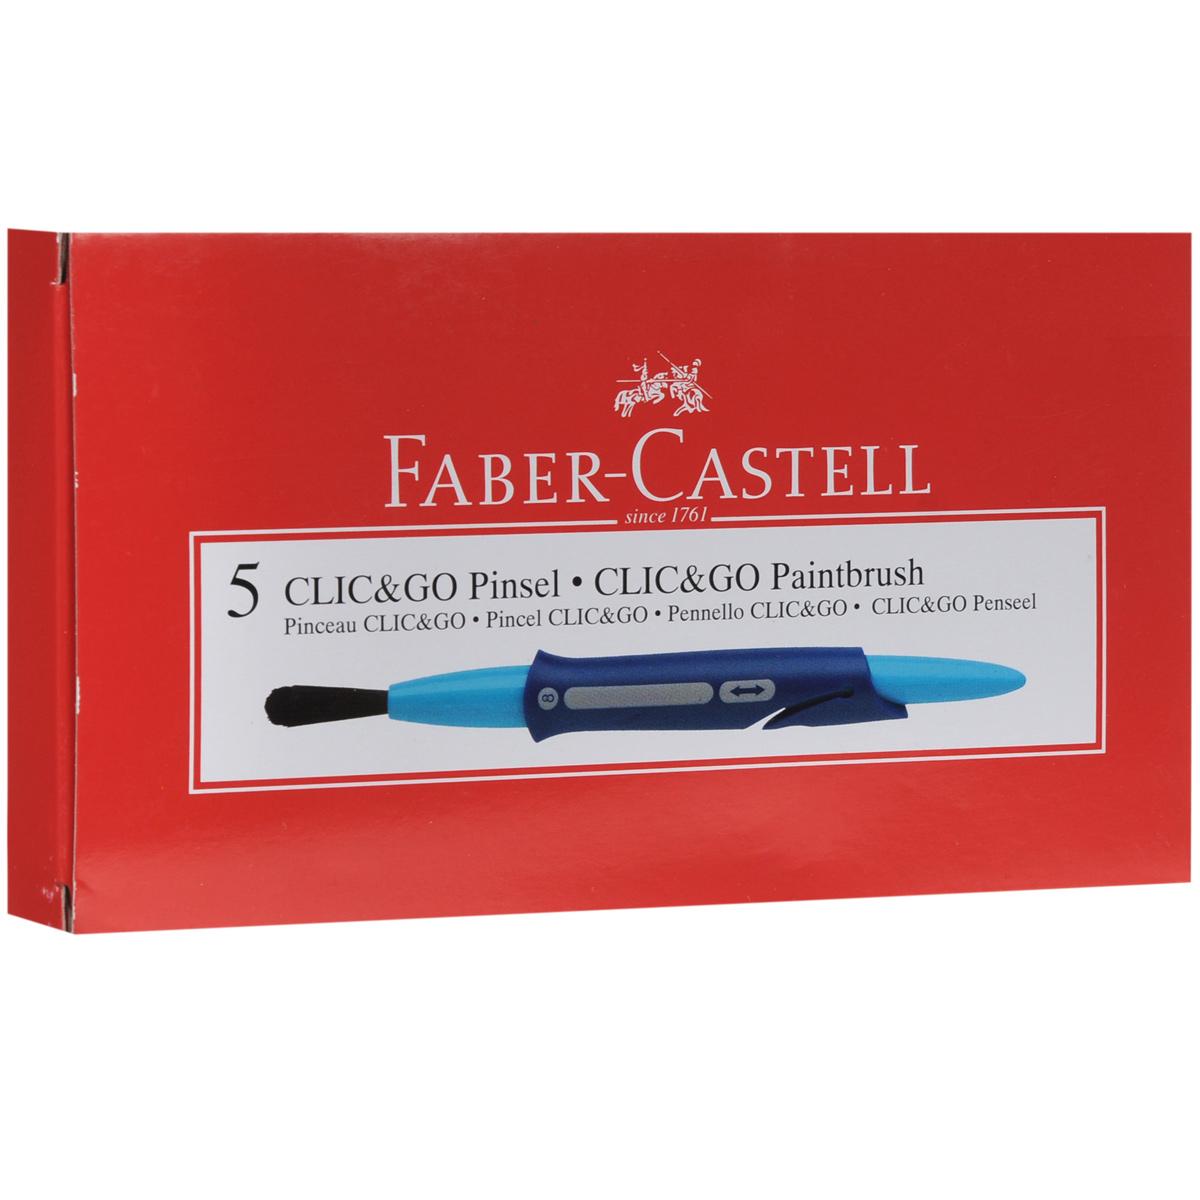 Набор круглых кистей Faber-Castell  Click&Go , 0,8 см, 5 шт -  Кисти